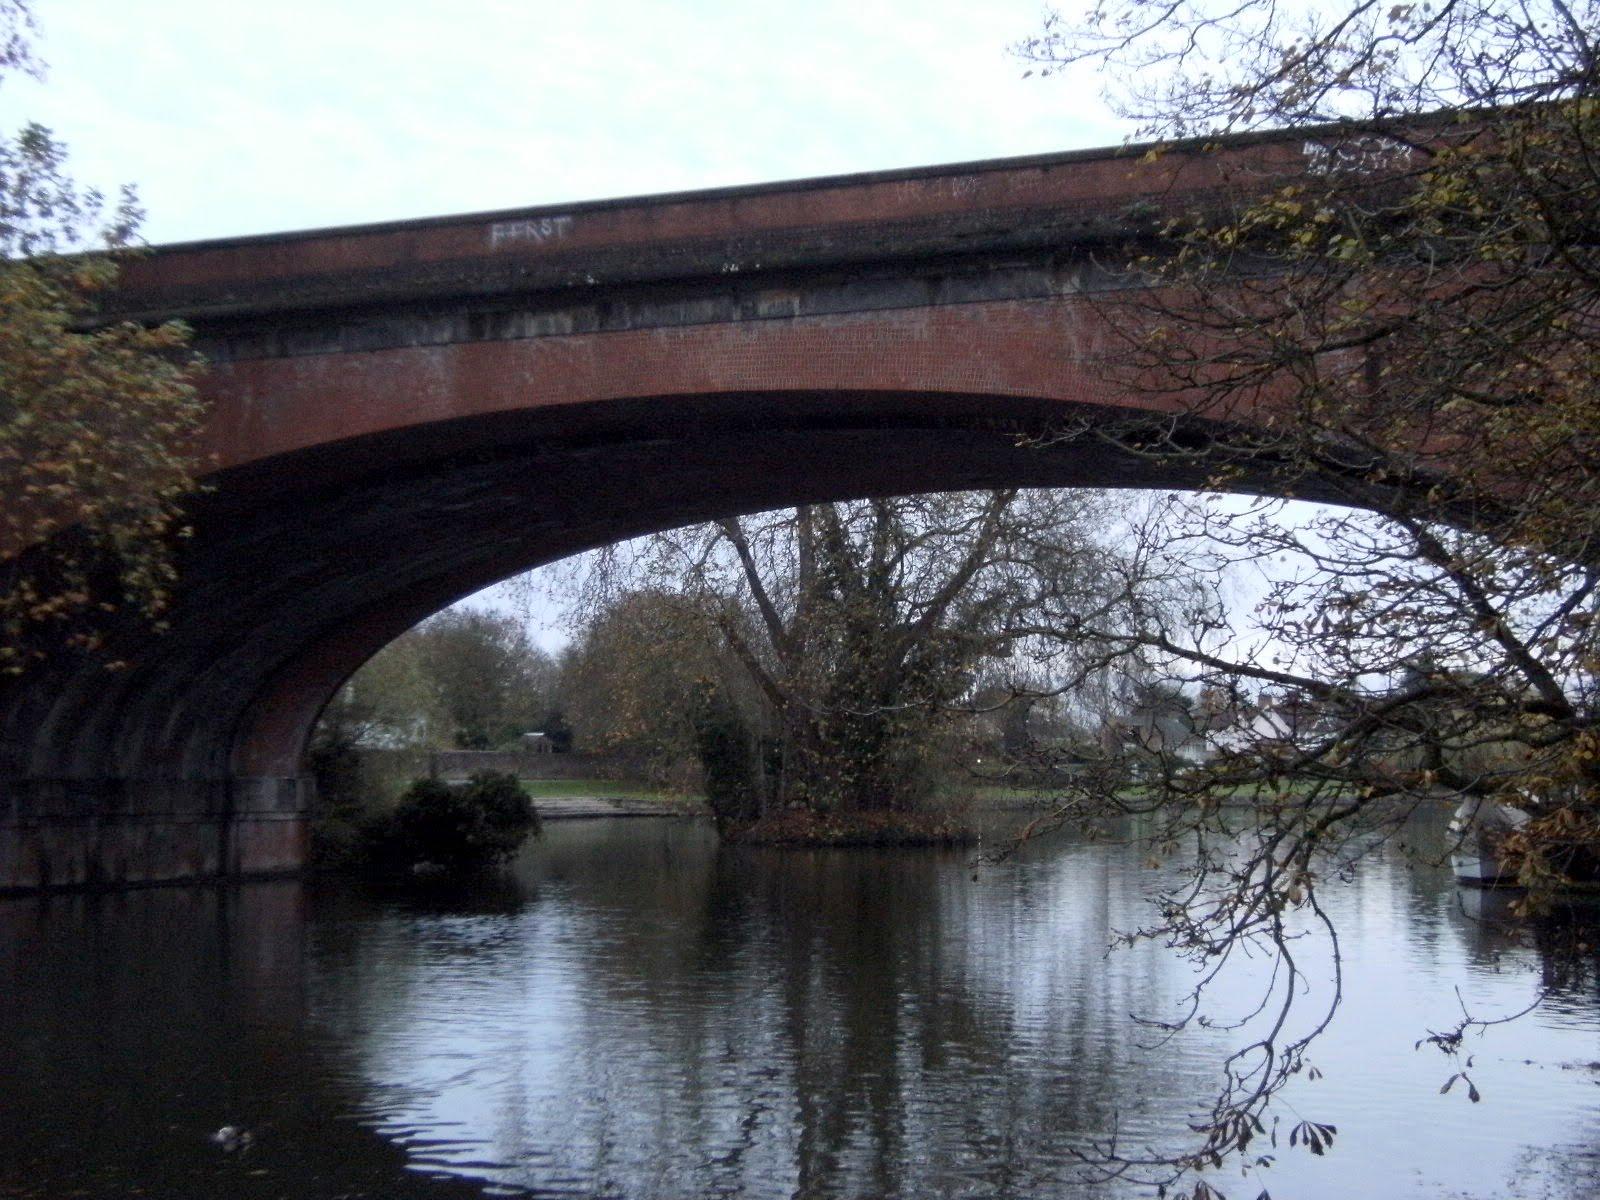 1011130042 One of the brick arches of Brunel's rail bridge, Maidenhead